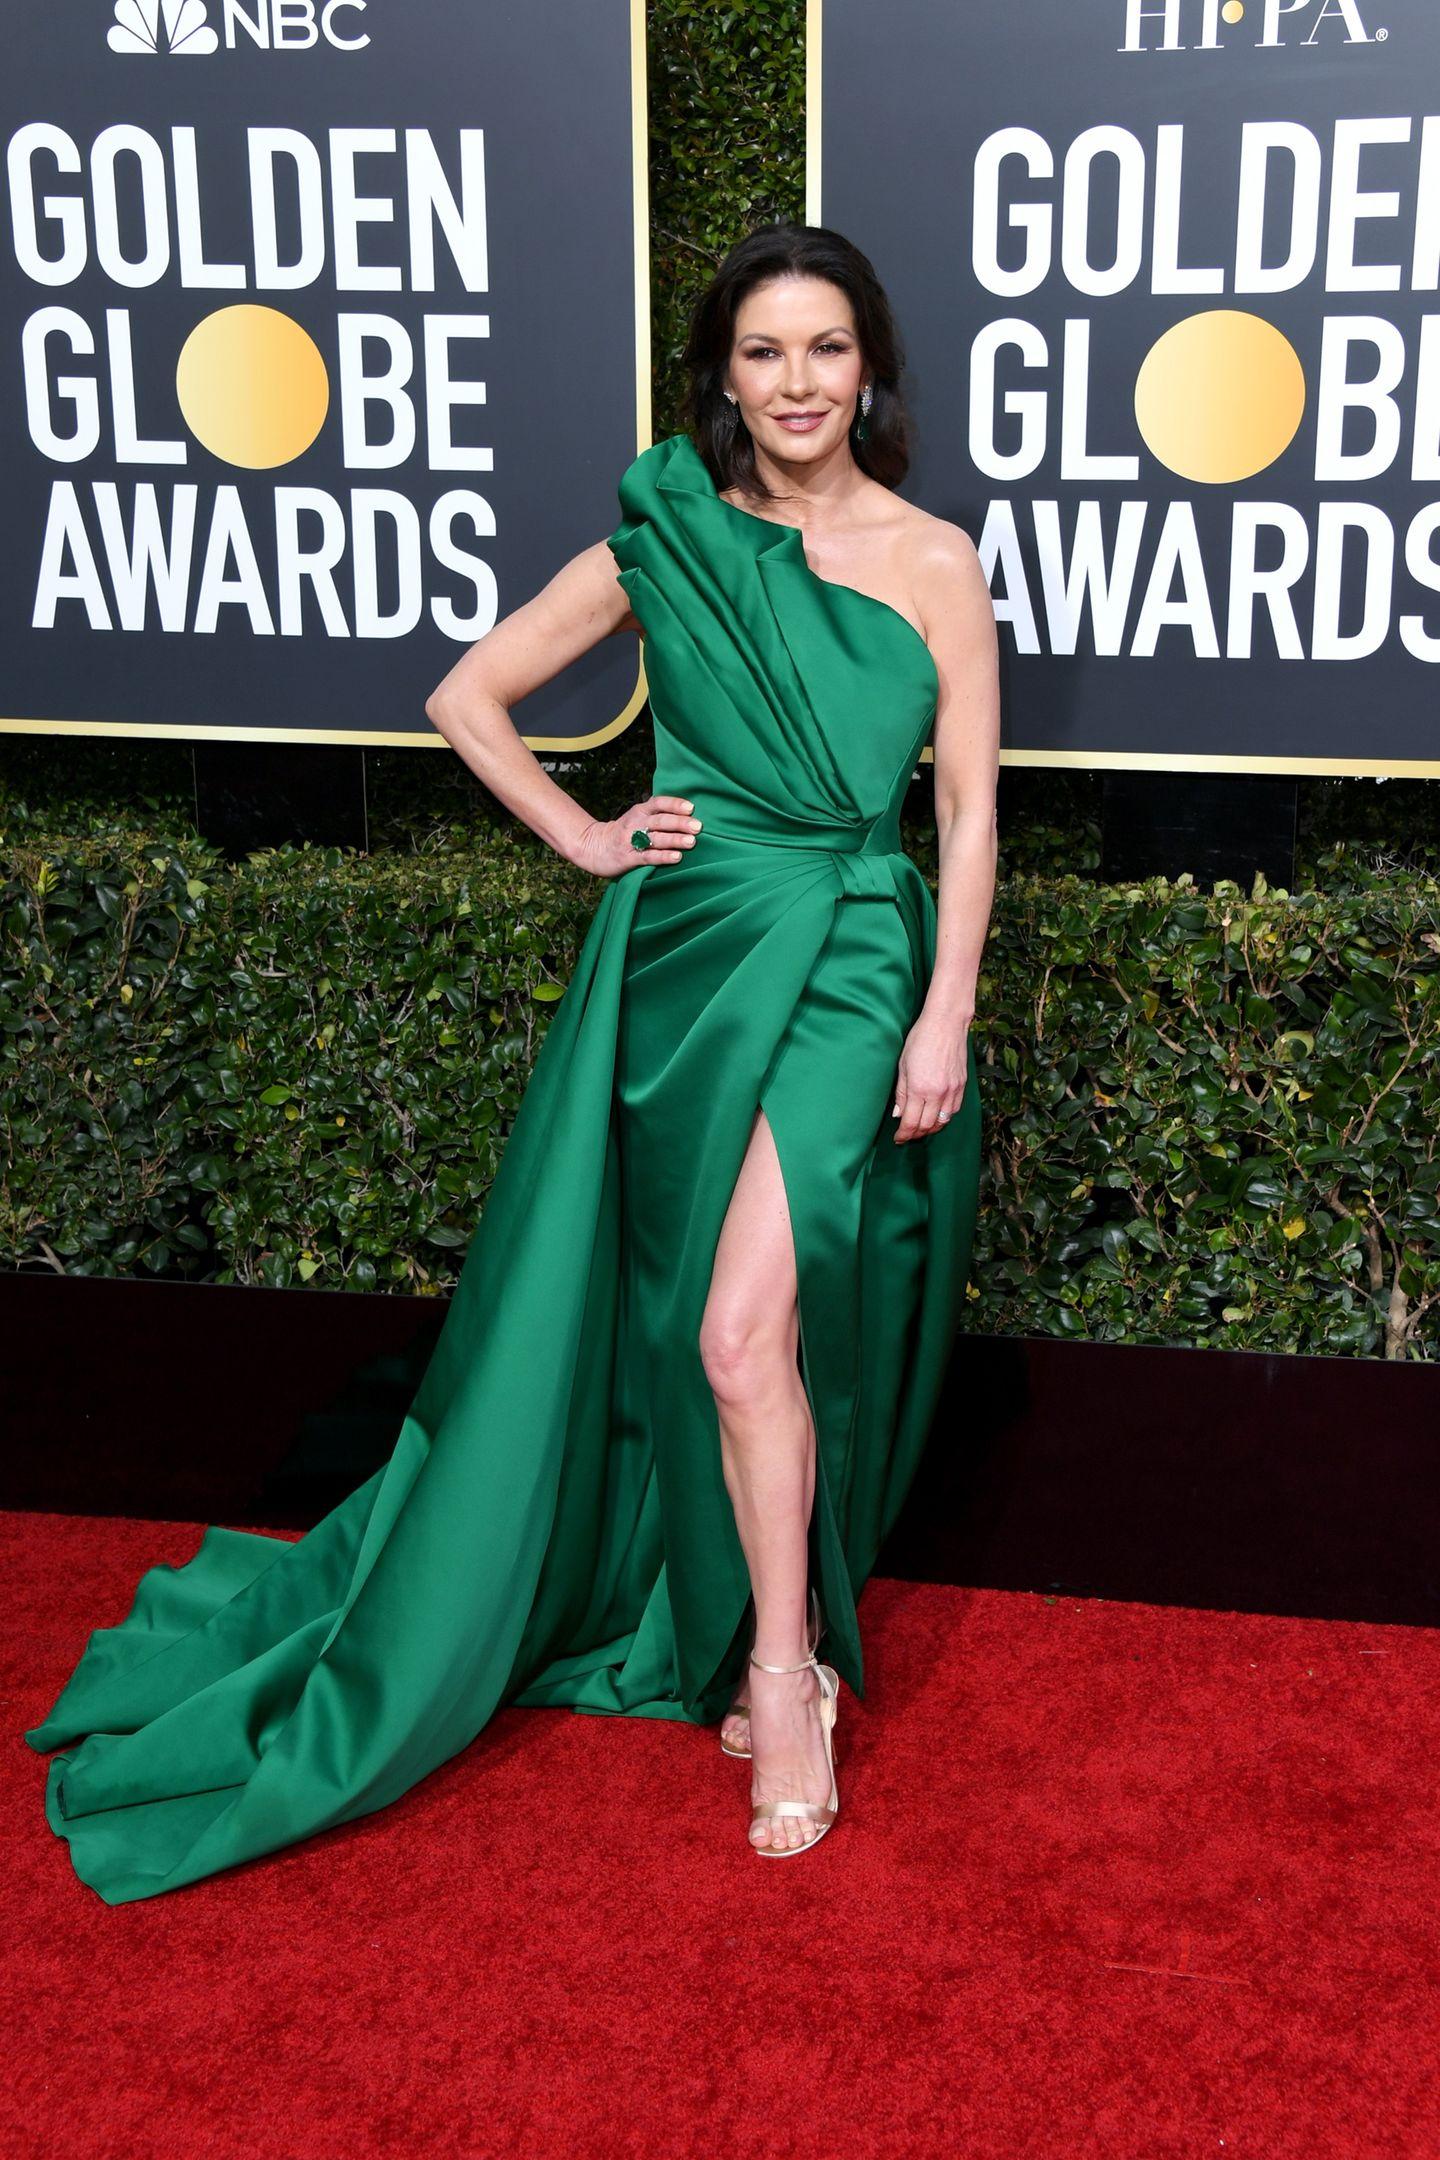 Im glamourösen Smaragd-Look strahlt Catherine Zeta-Jones bei den Golden Globes als Hollywood-Göttin.